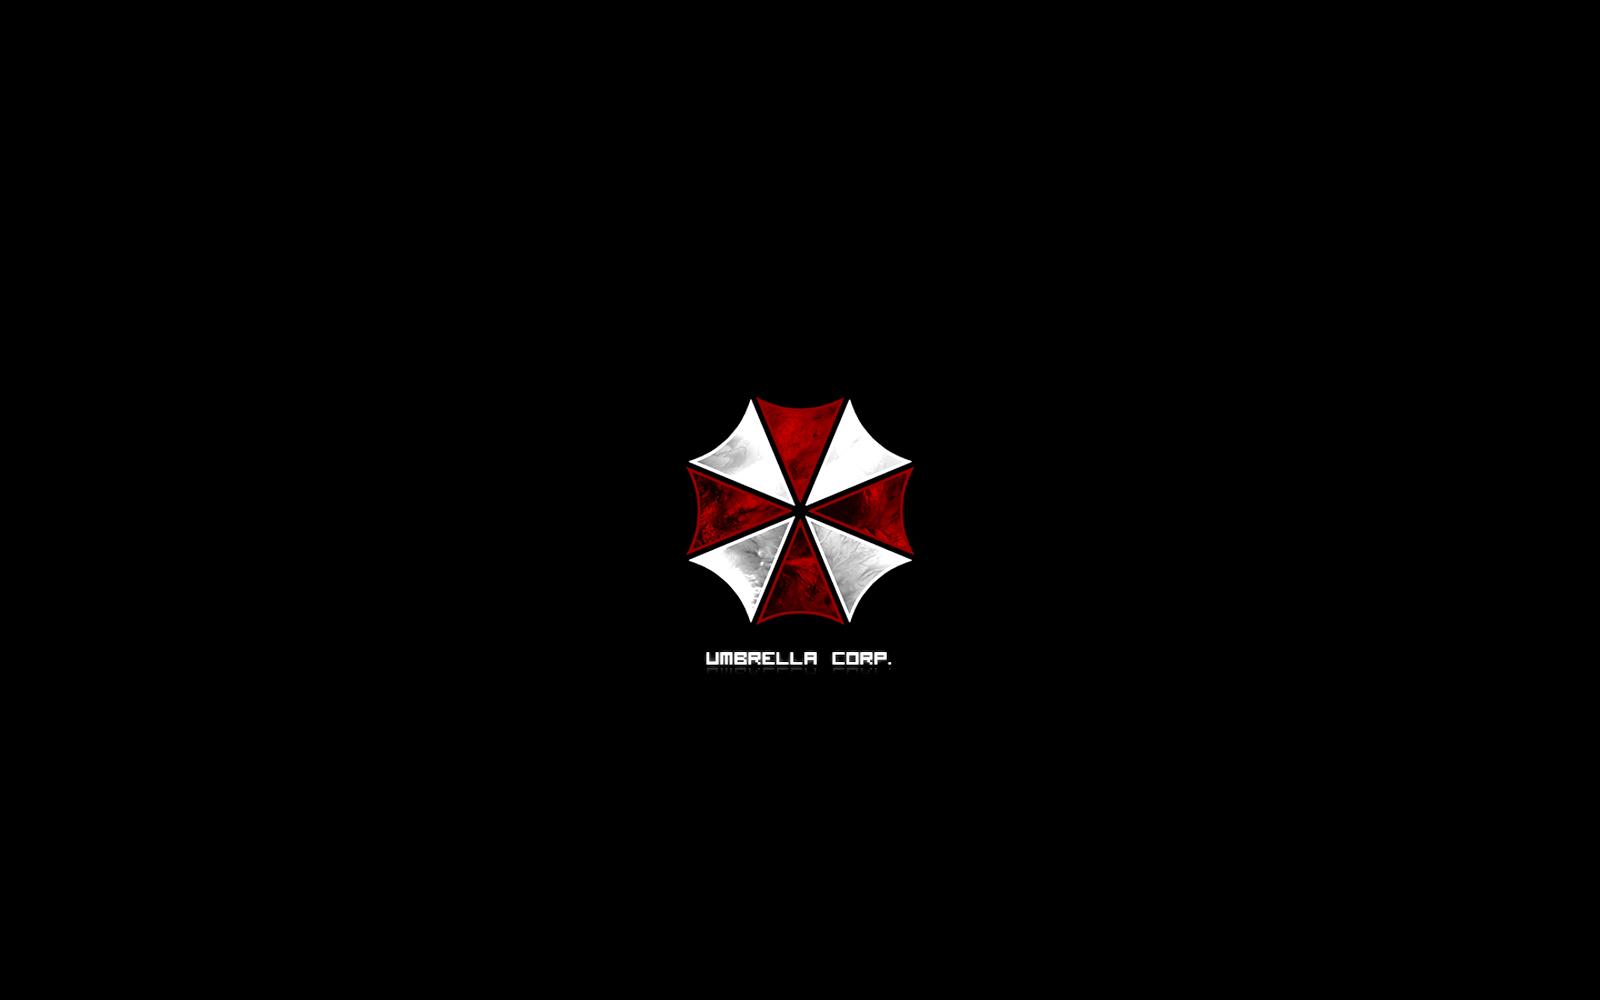 Umbrella Corporation Logo Hd Wallpapers Desktop Wallpapers